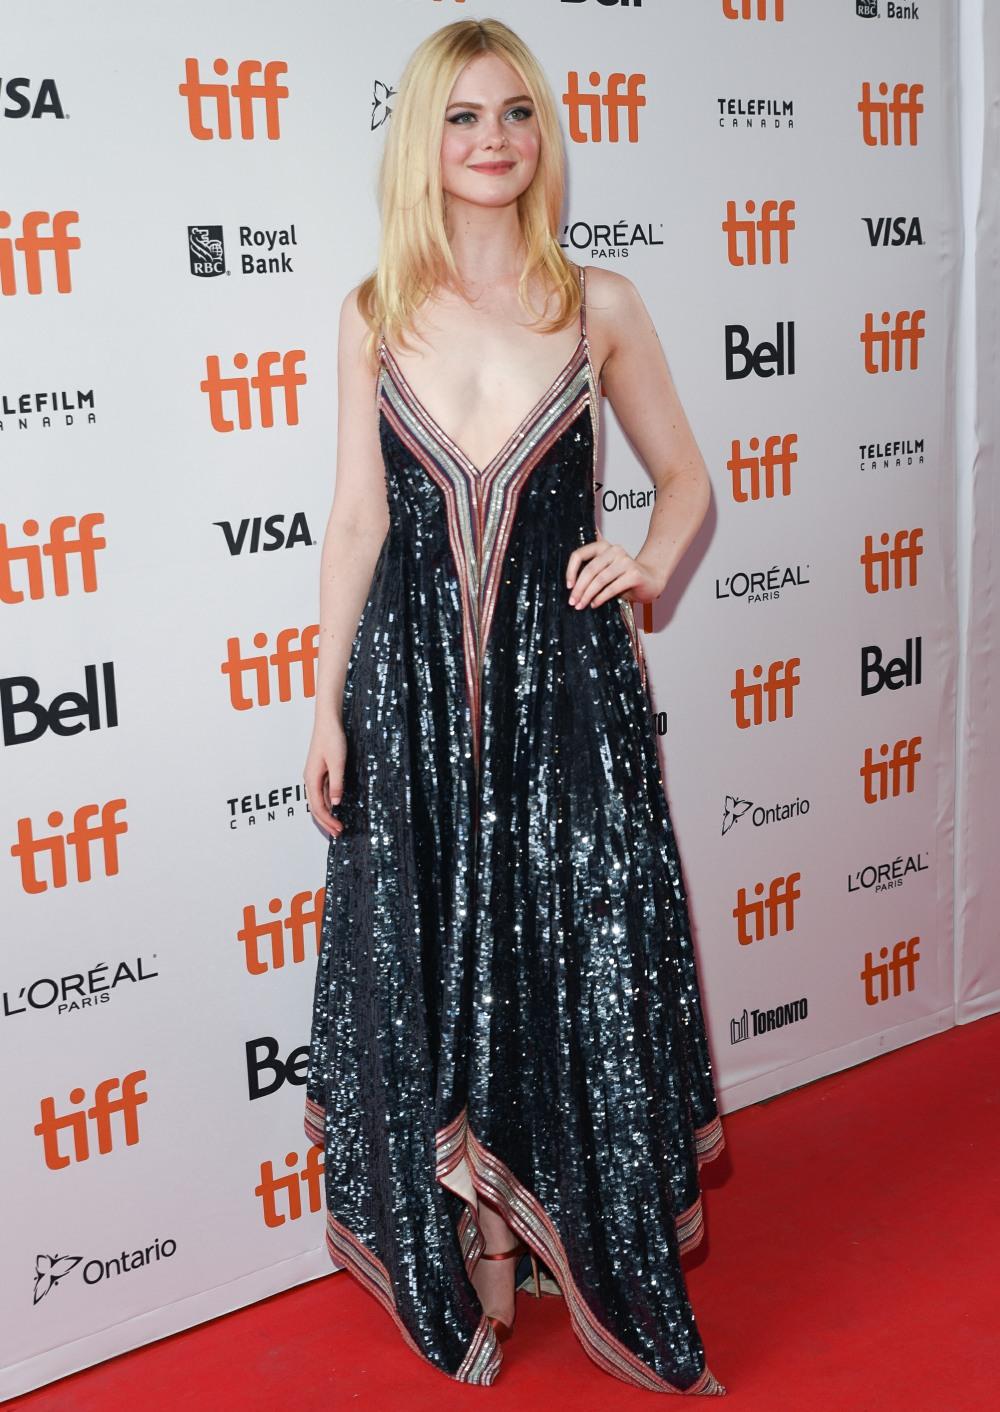 2018 Toronto Film Festival - 'Teen Spirit' - Premiere